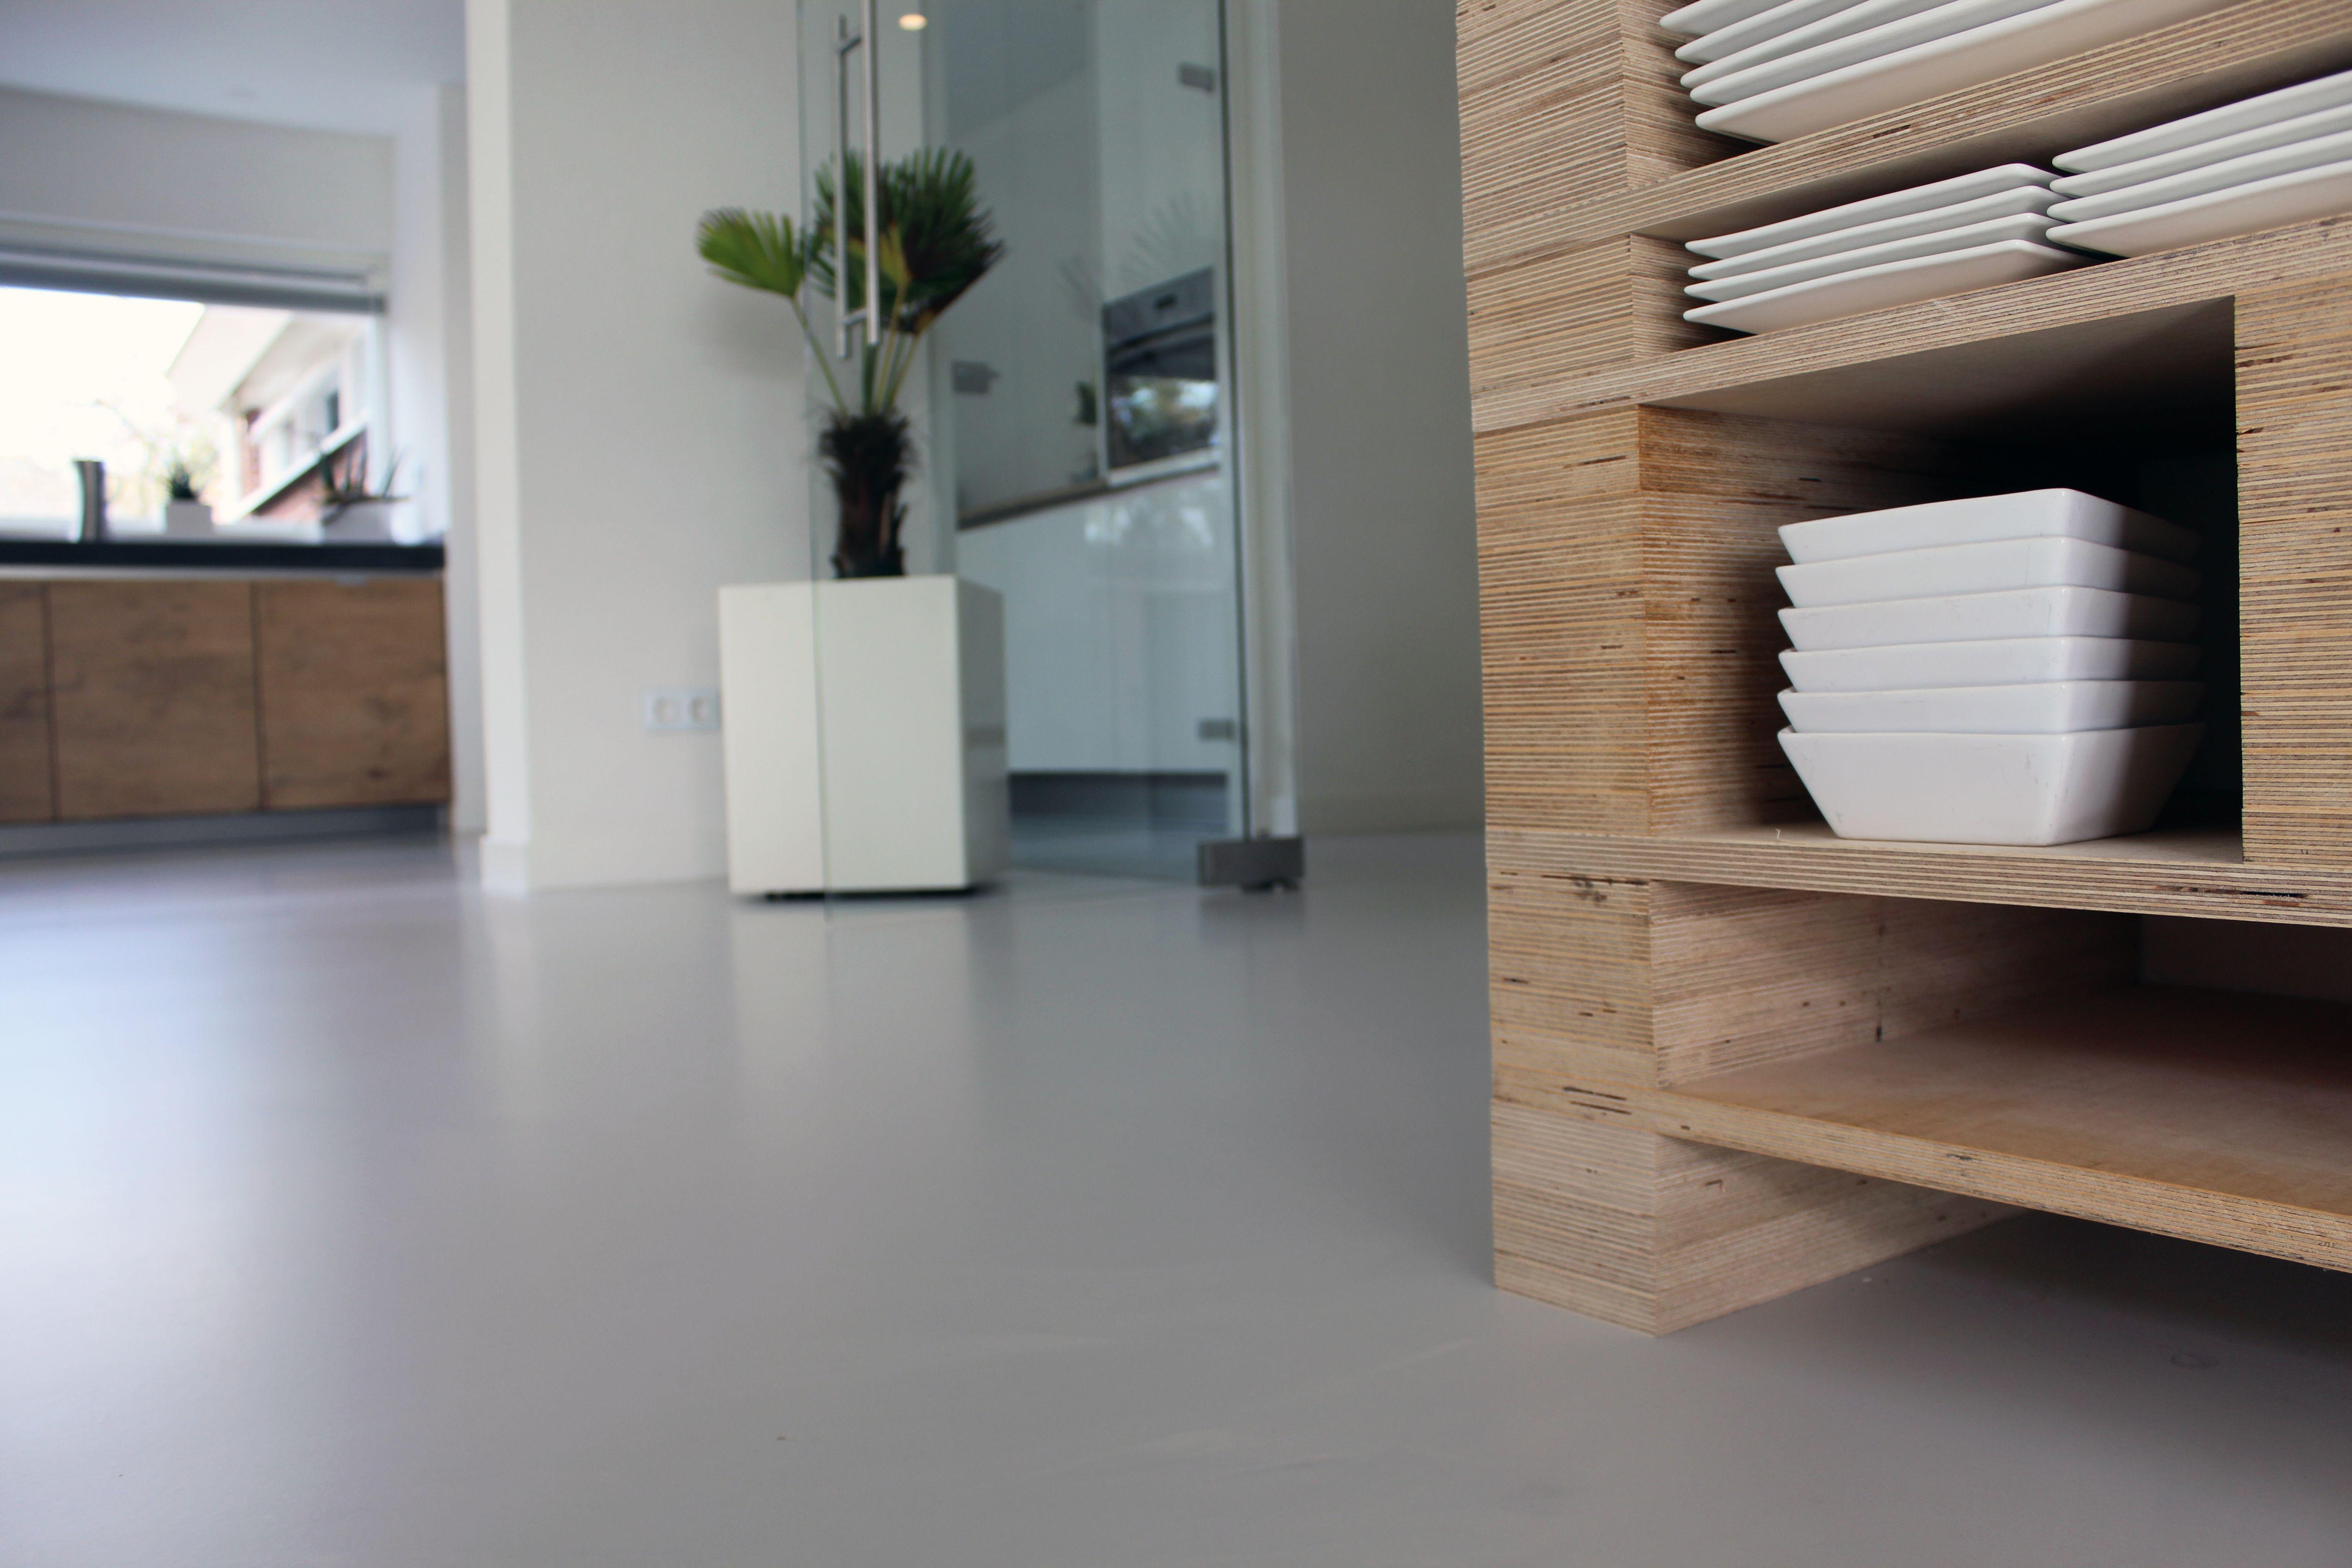 Betonlook gietvloer motion gietvloeren #gietvloer #betonlook